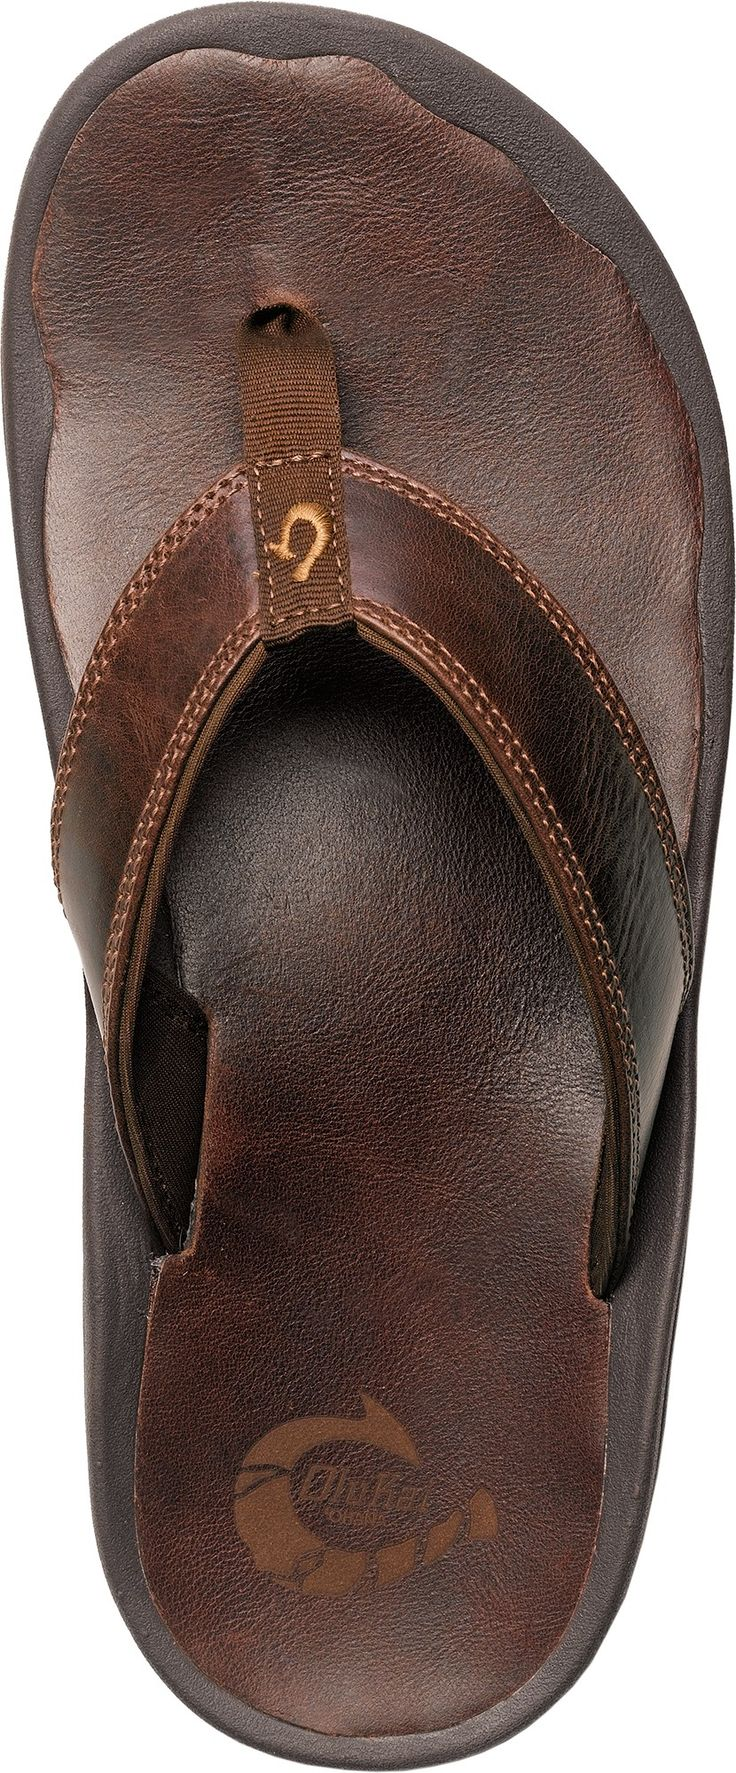 OluKai 'Ohana Leather Flip-Flops - Men's - Free Shipping at REI.com